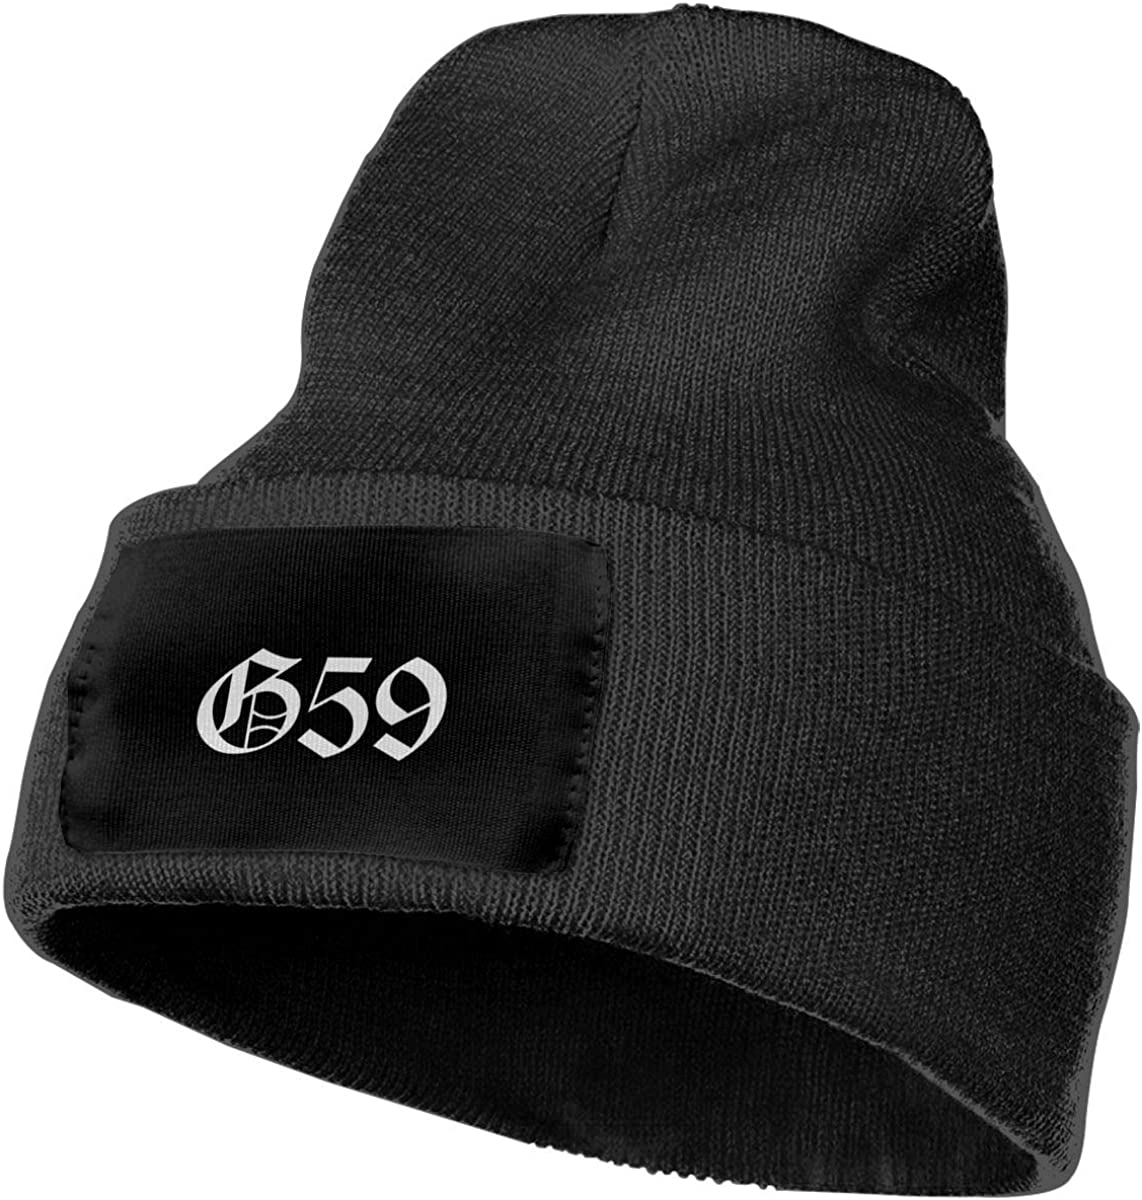 favorite KJVK Uicideboy Custom Beanie Hat Unisex Warm K Adult Max 50% OFF Hats Winter